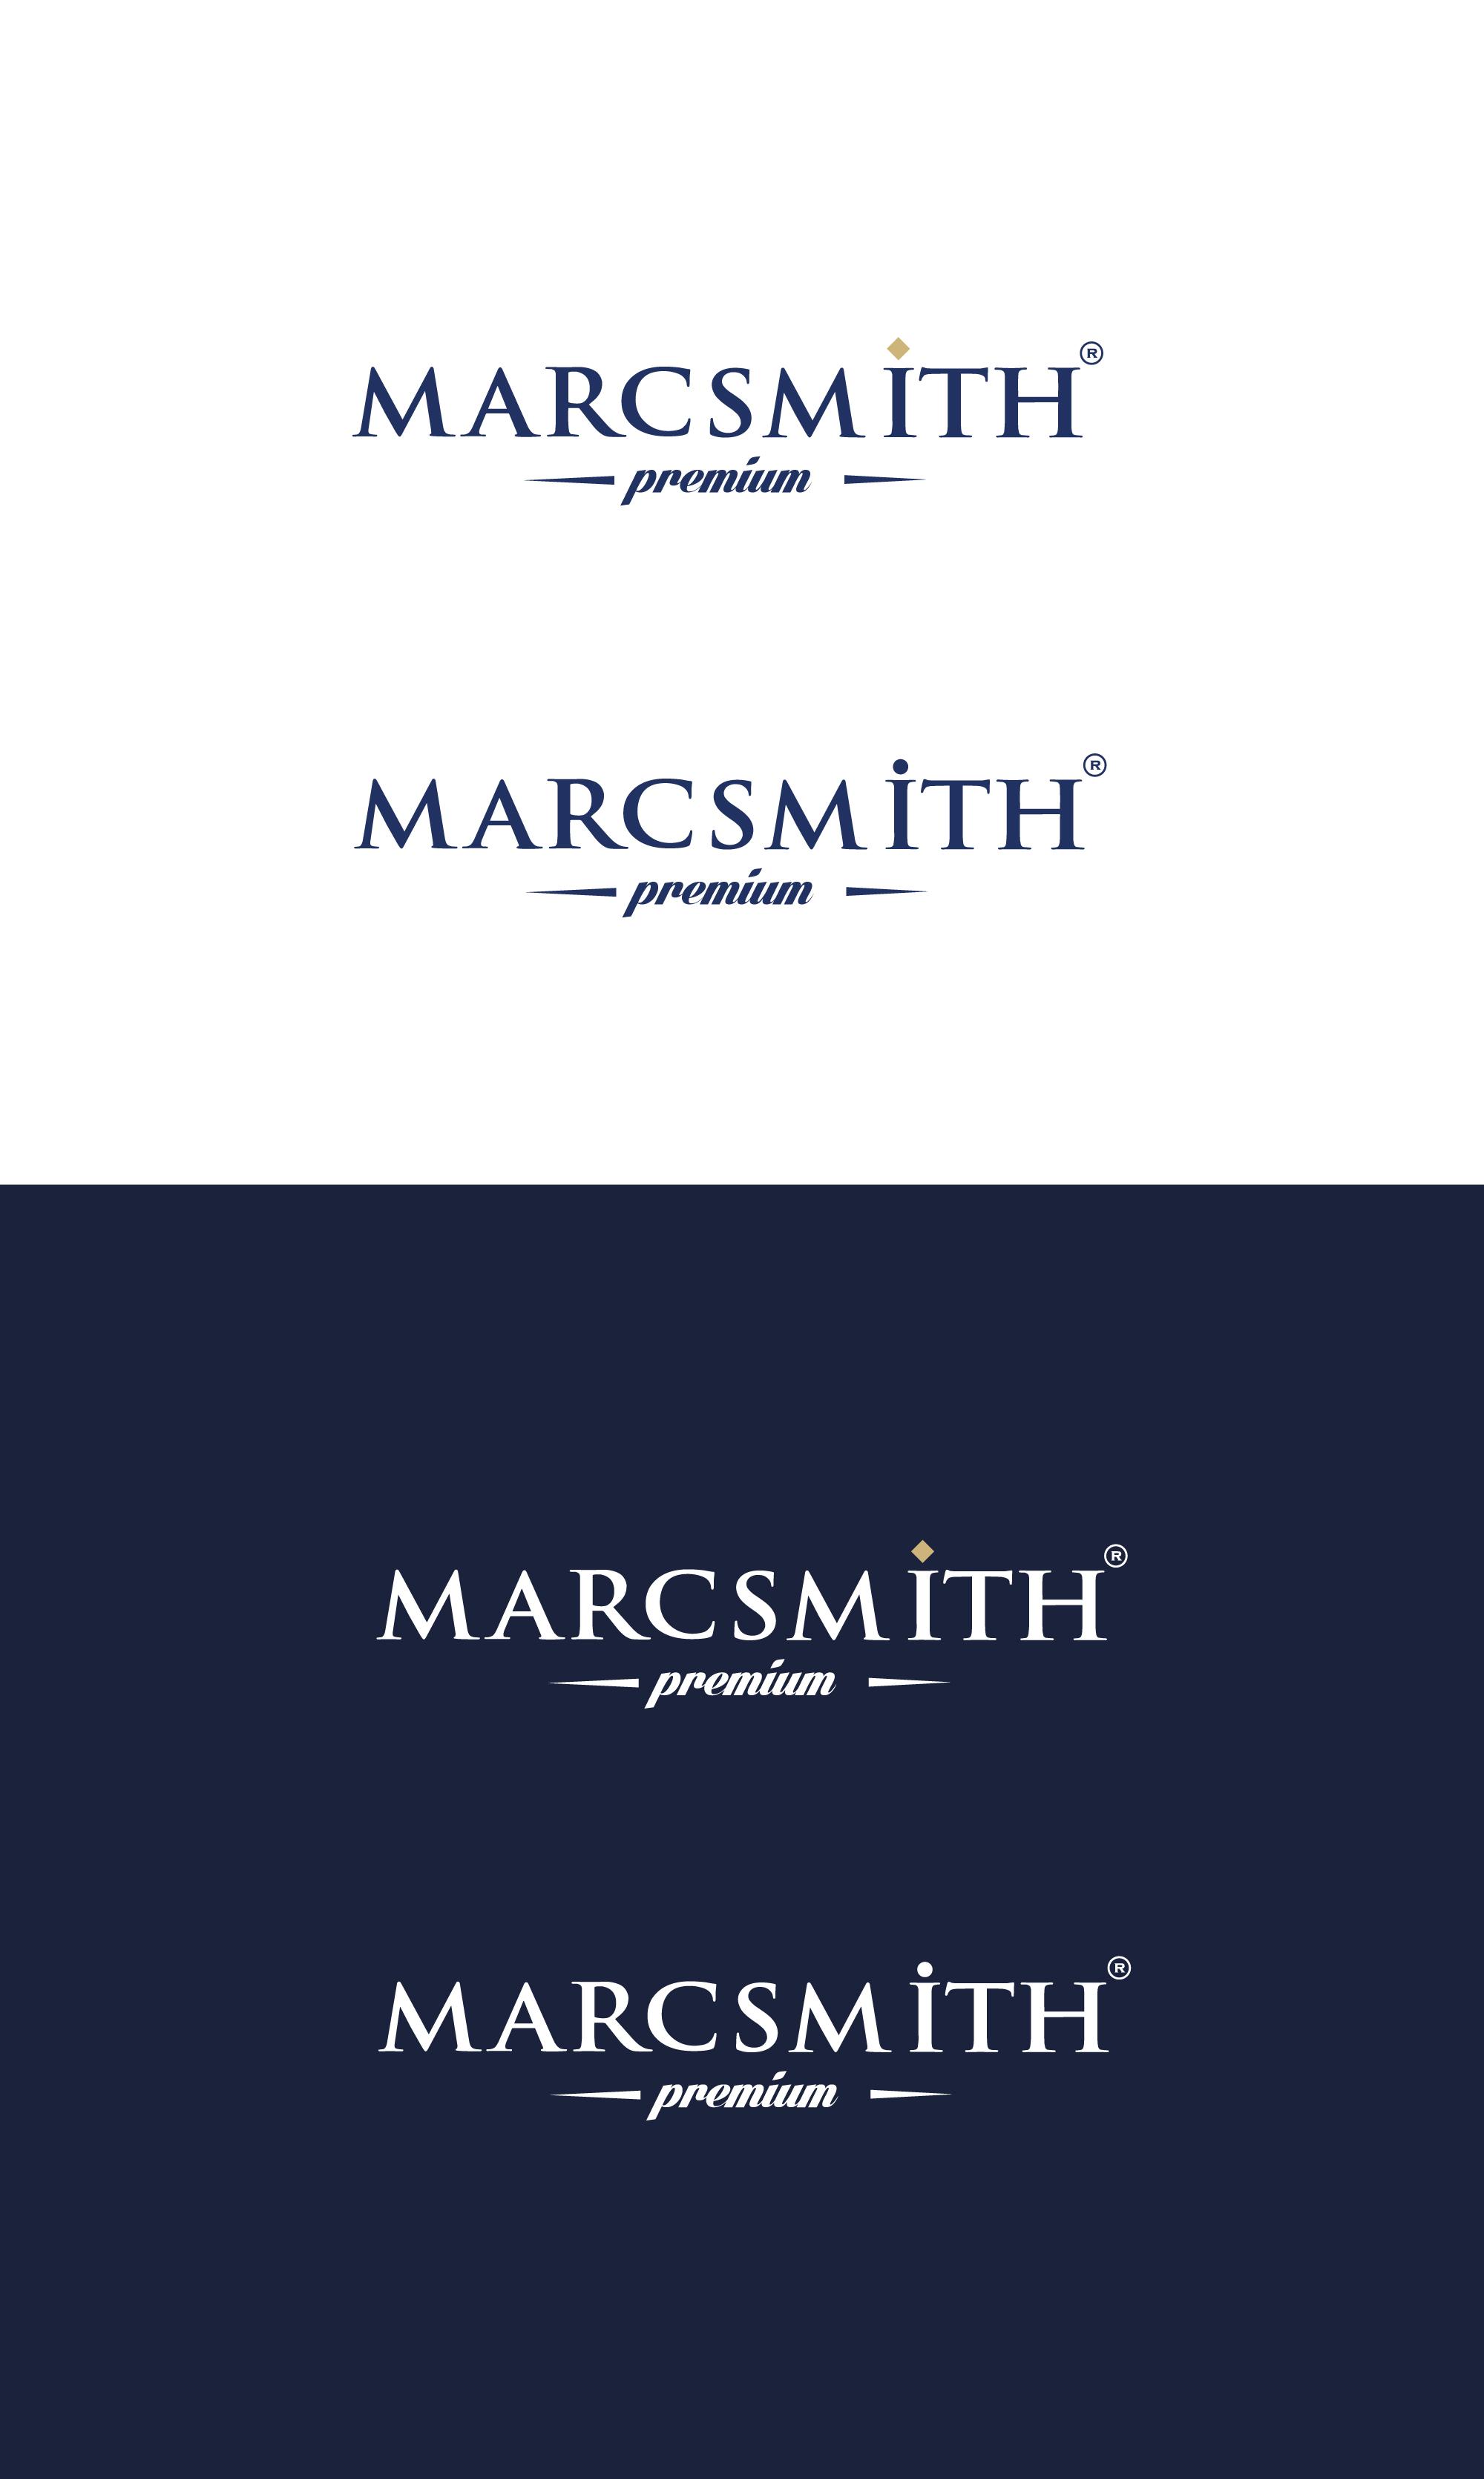 Разработка логотипа для ЛИЧНОГО БРЕНДА.  фото f_8955d04cfc934ff7.jpg